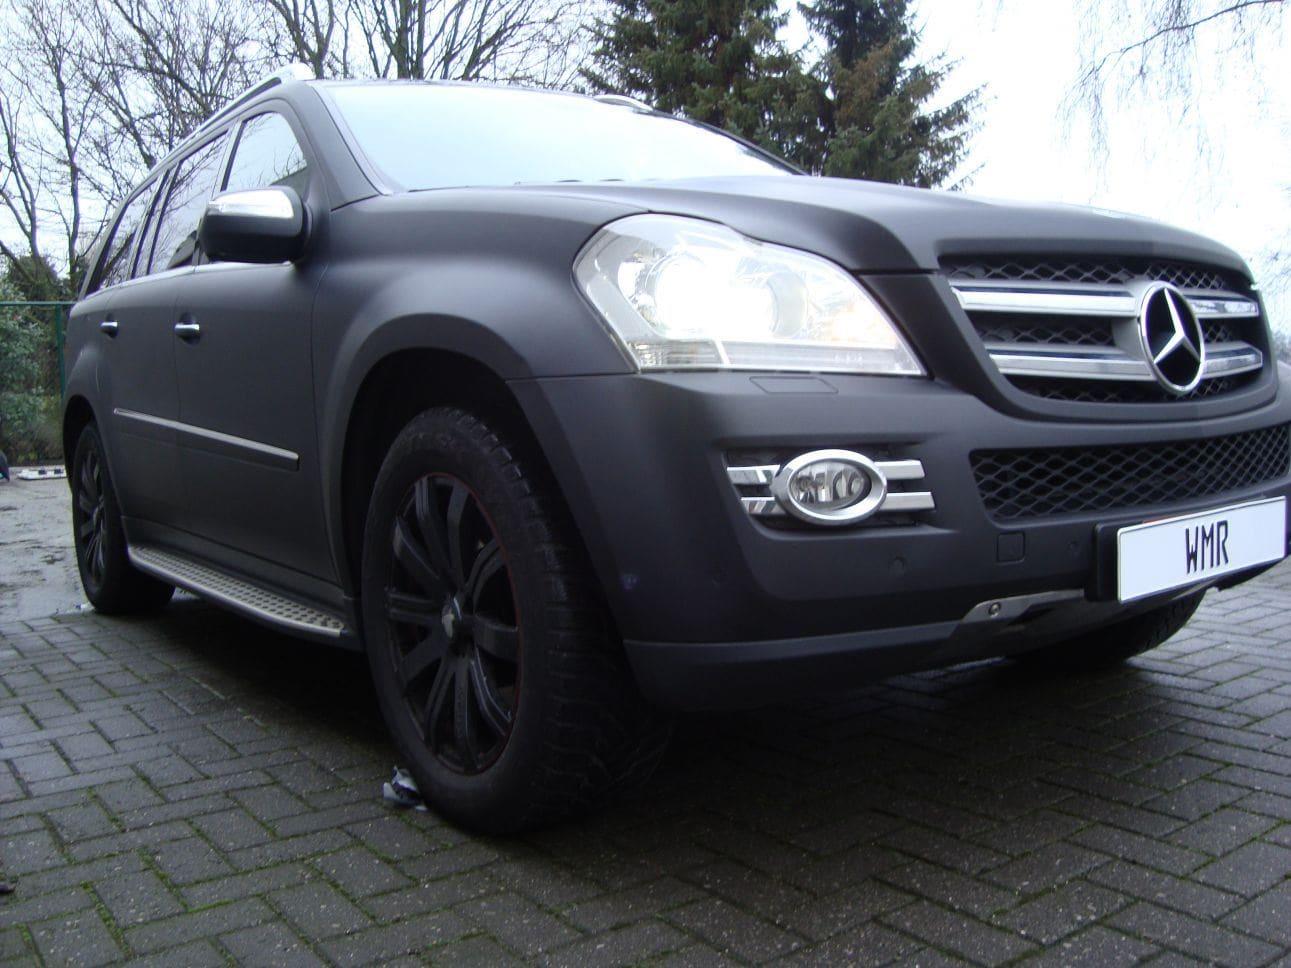 Mercedes GL met Mat Zwarte Wrap, Carwrapping door Wrapmyride.nu Foto-nr:6286, ©2021